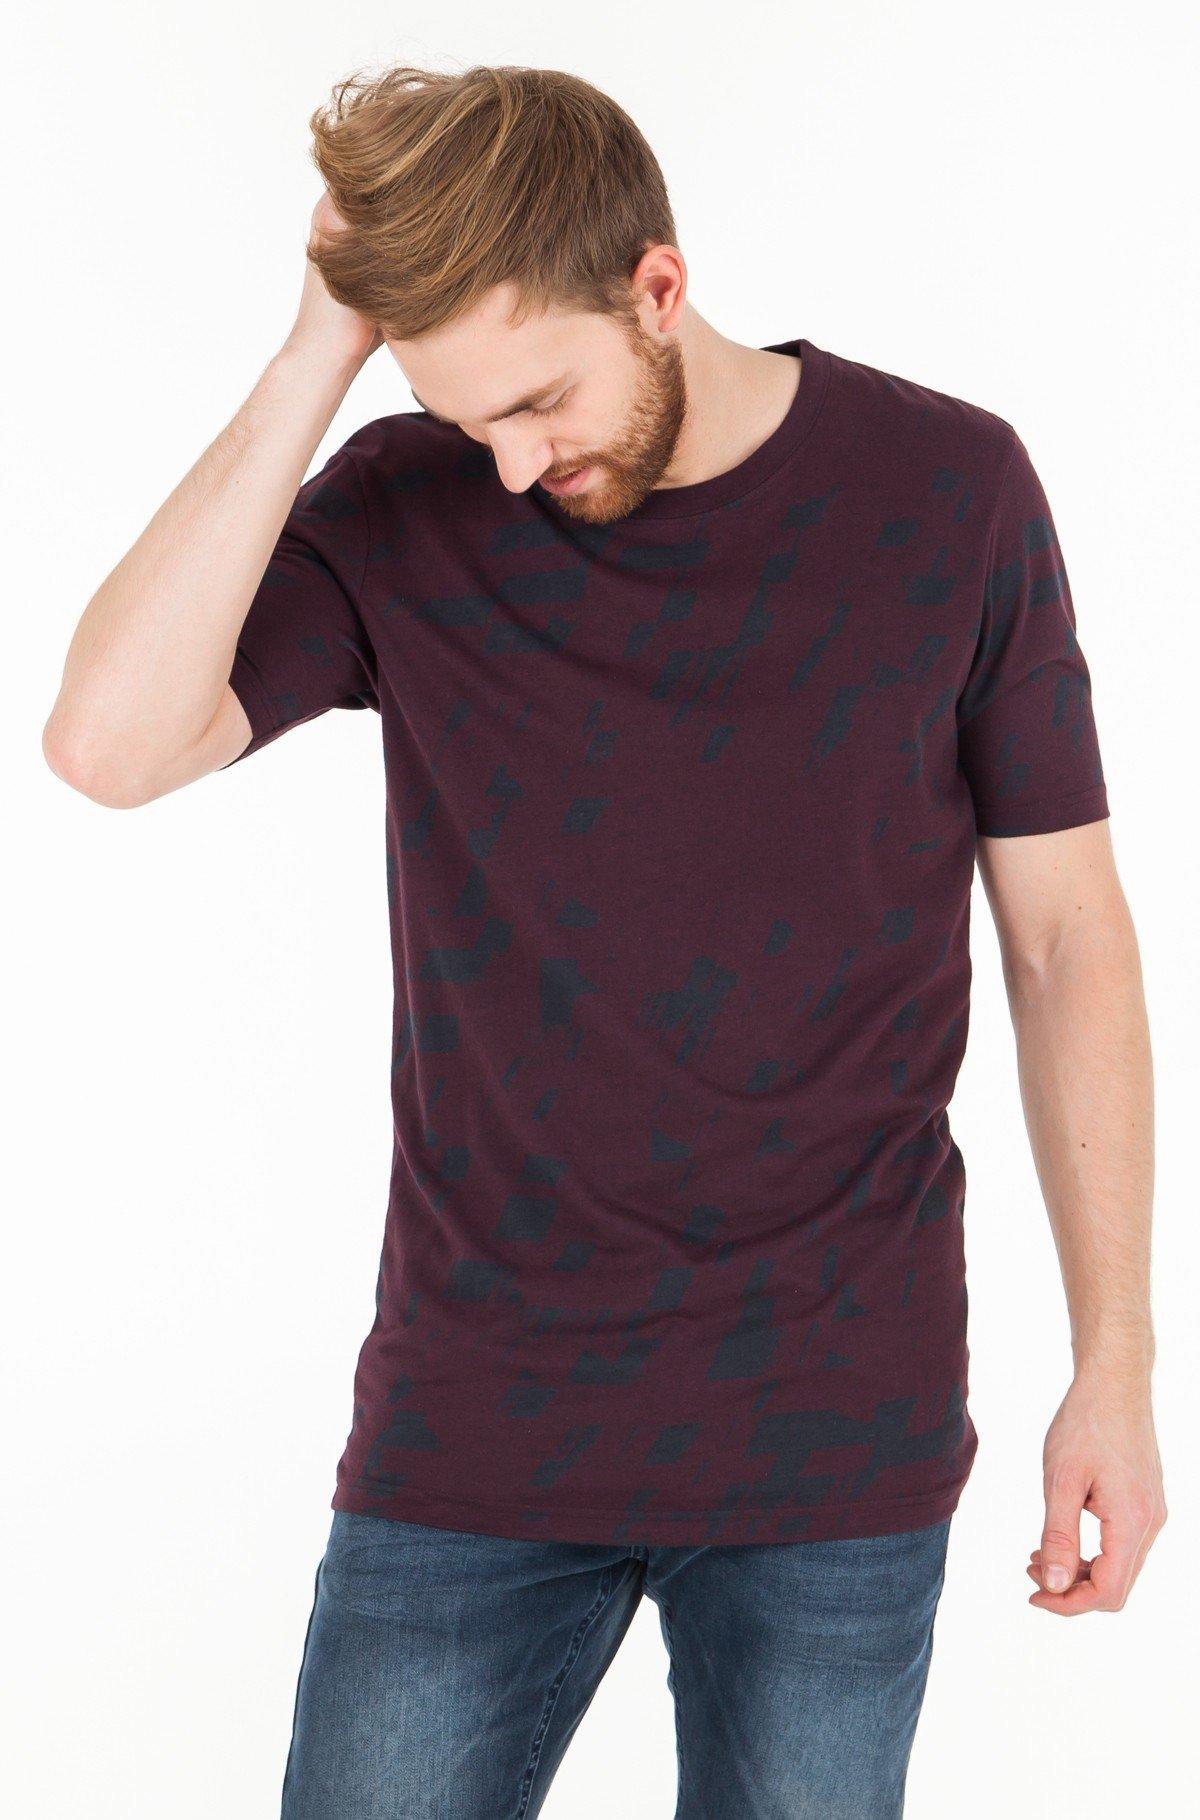 T-shirt TRAVERS/PM506016-full-1